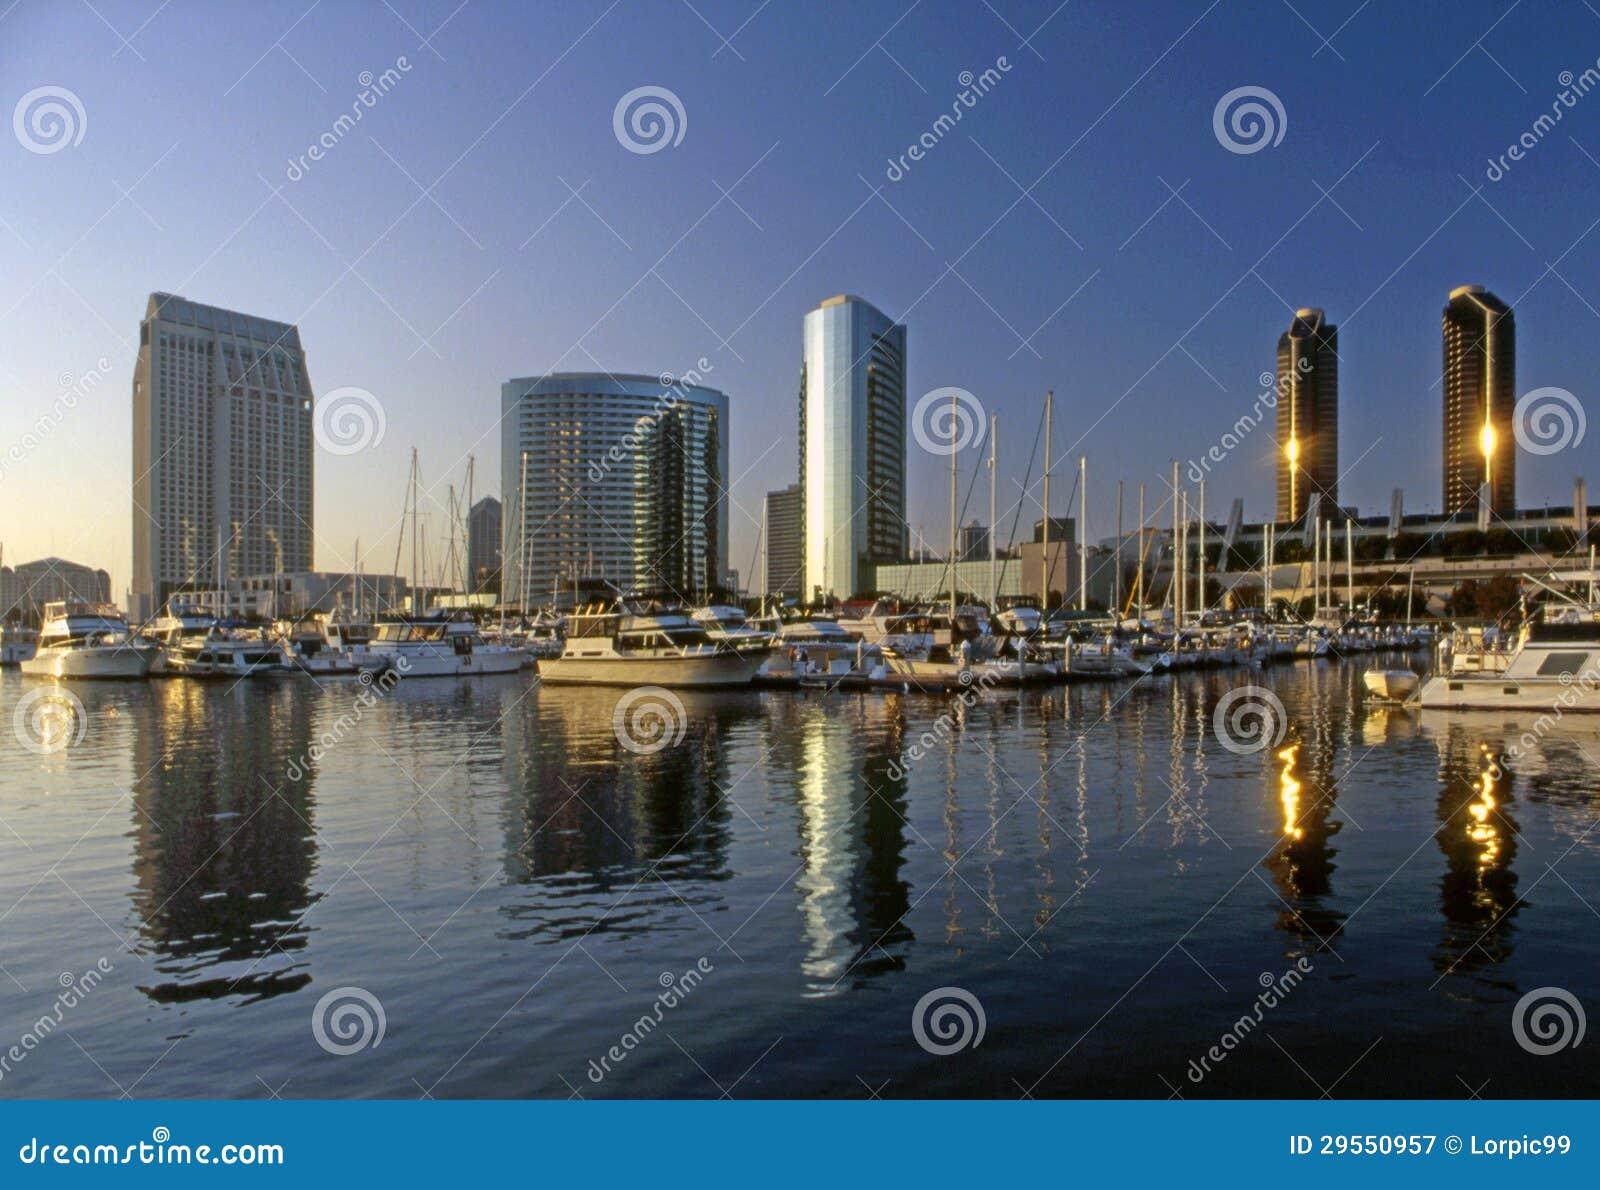 圣迭戈, Embarcadero海滨广场,加利福尼亚